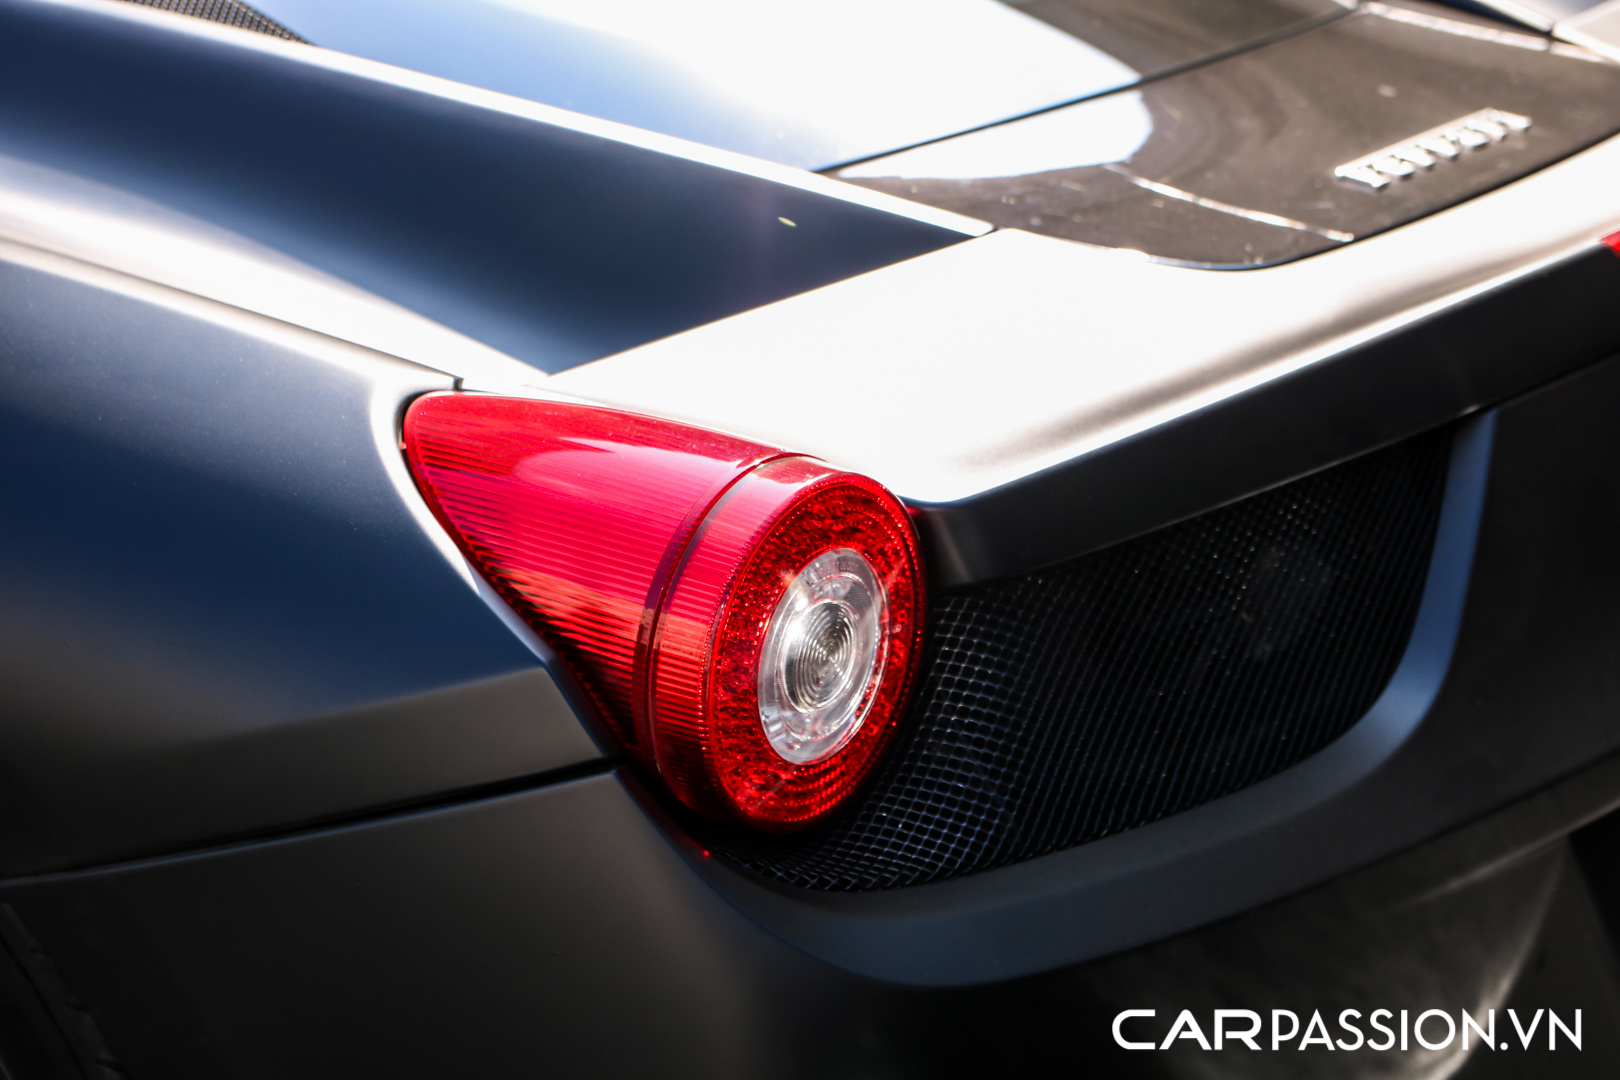 Ferrari 458 Italia đen mờ7.JPG